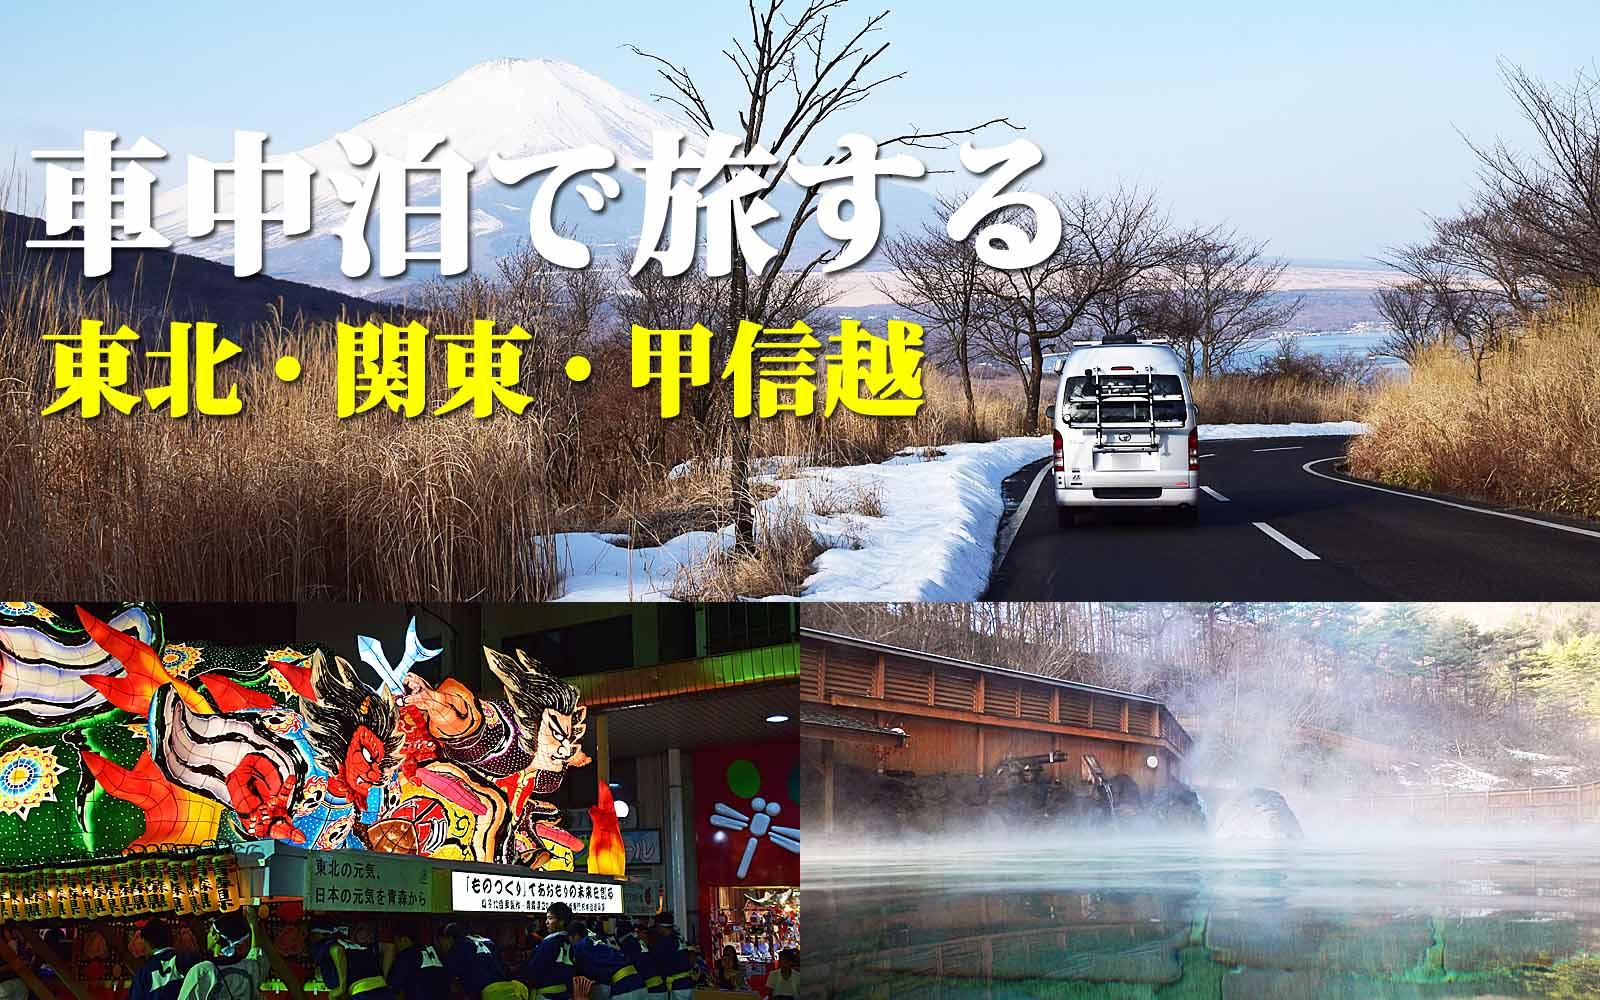 東北・関東・甲信越 車中泊旅行ガイドの決定版!